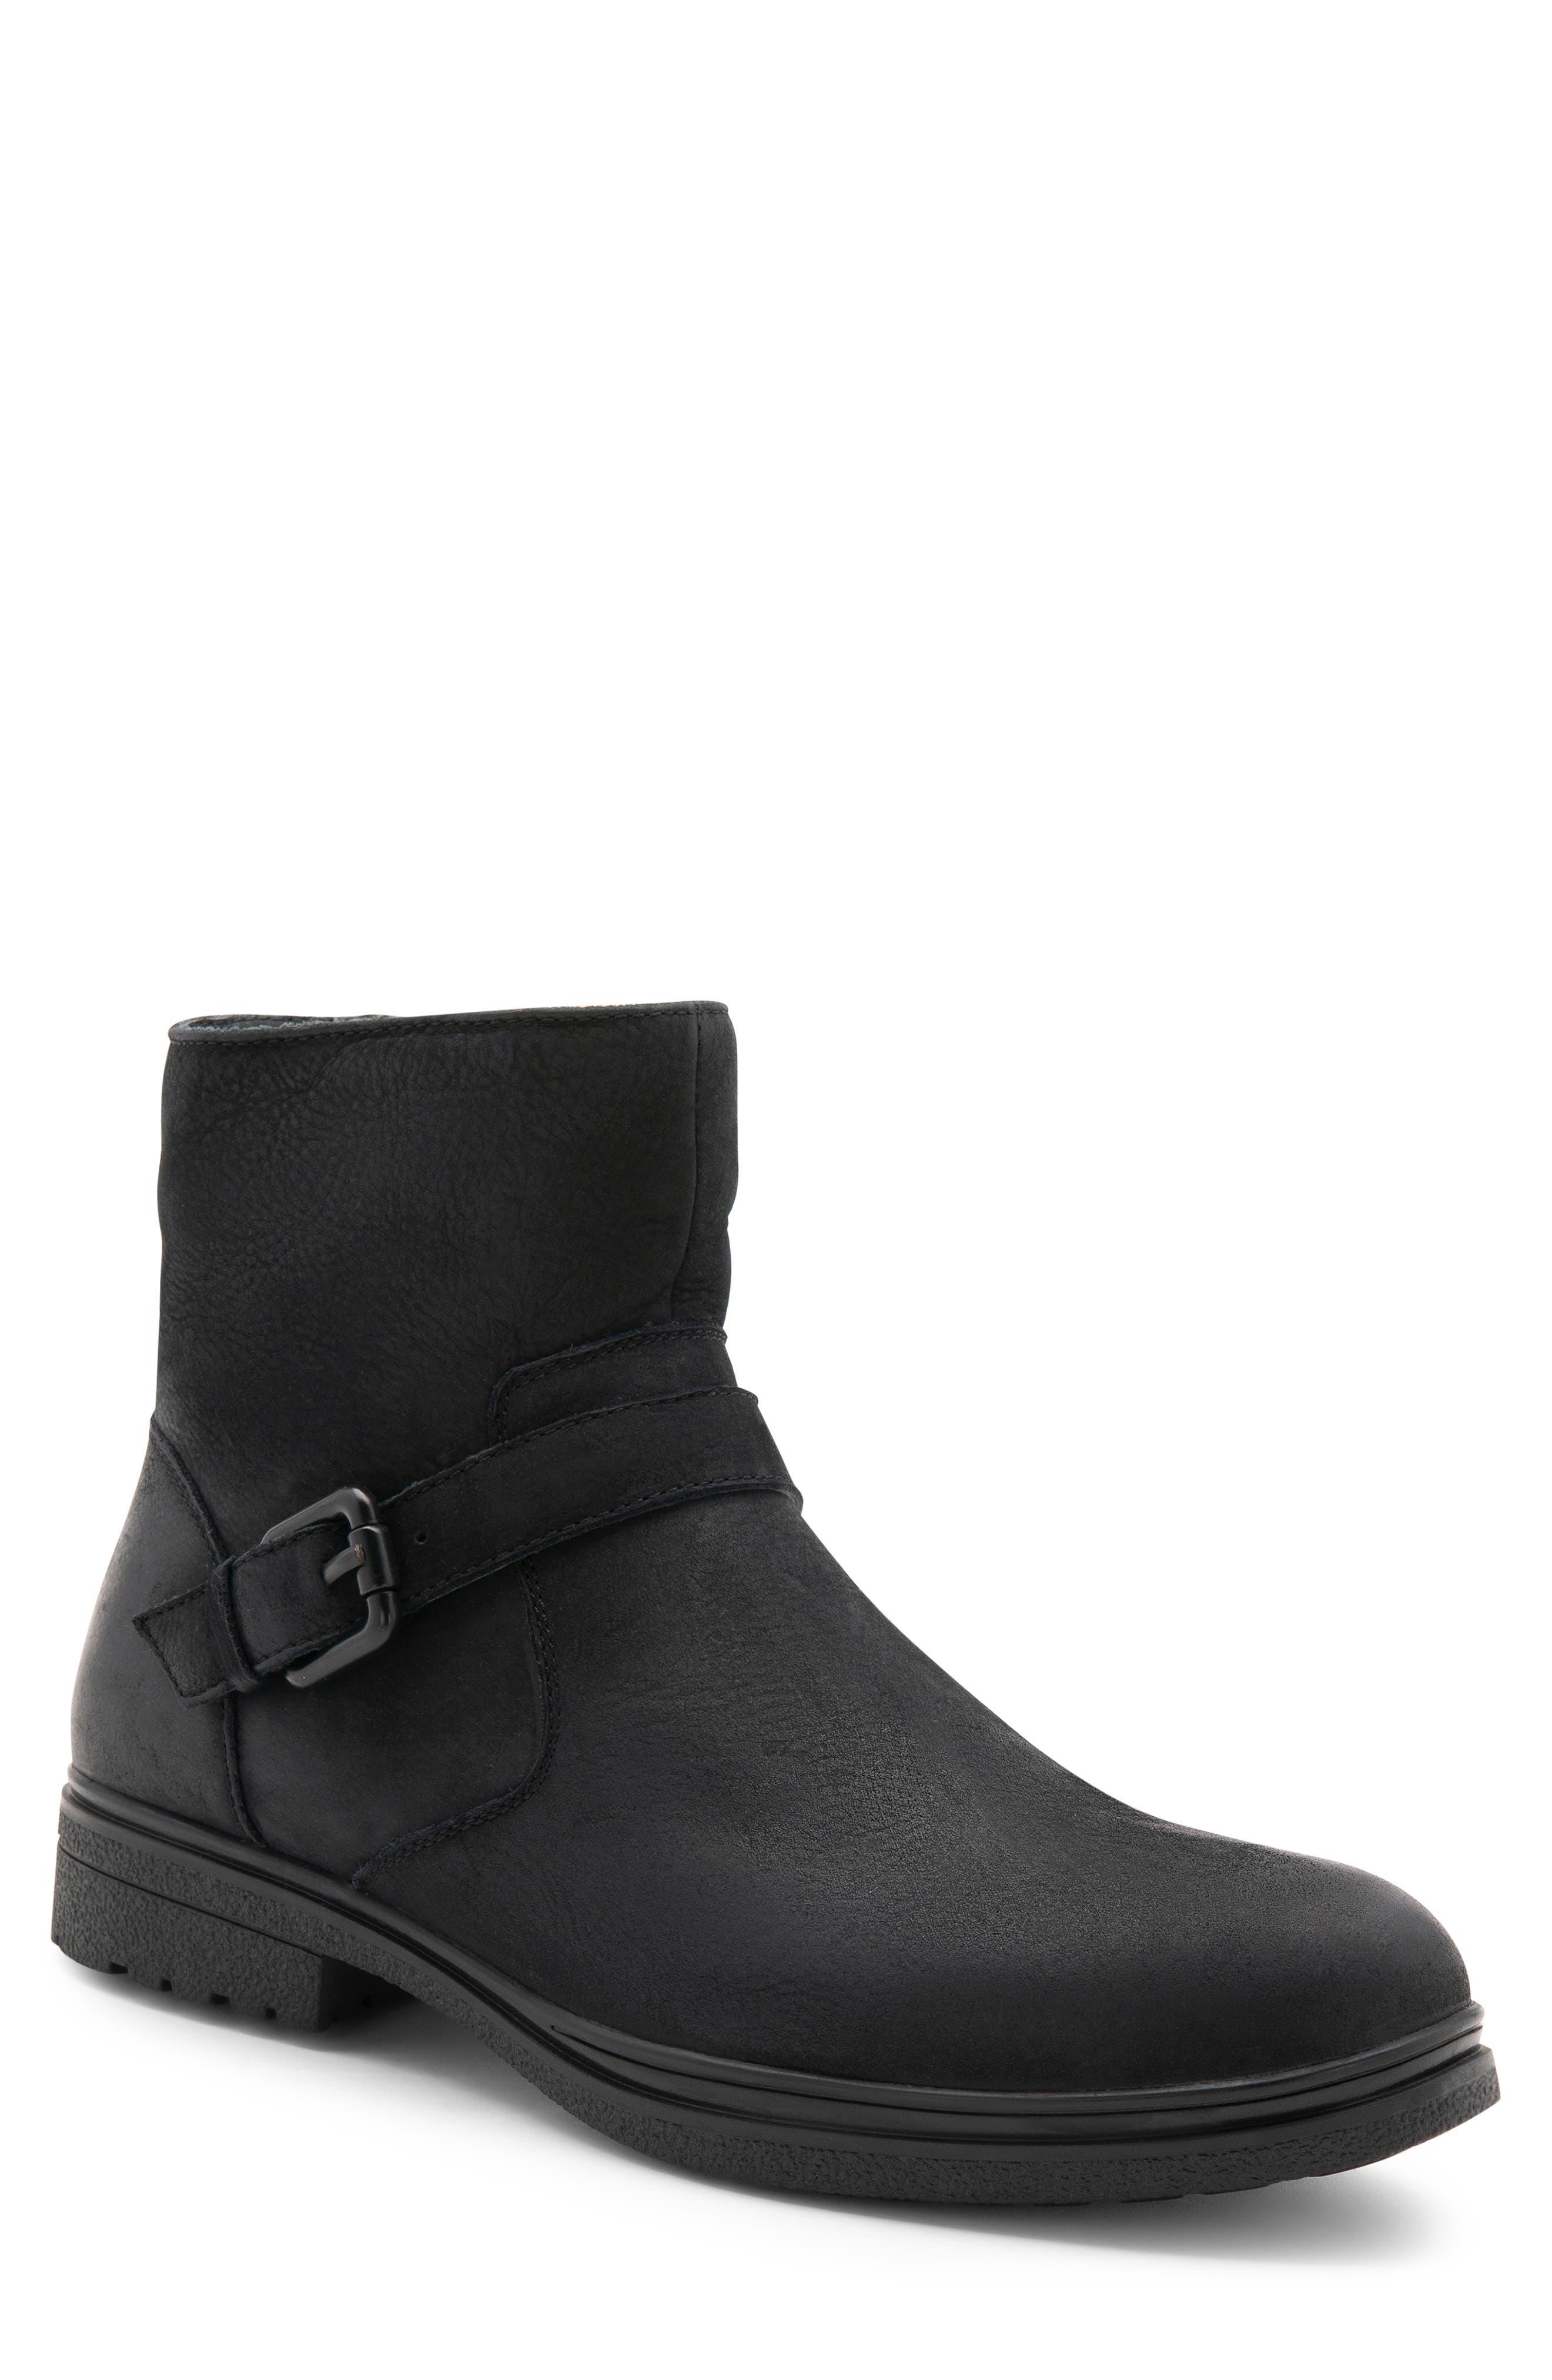 Sylvester Waterproof Buckle Boot,                         Main,                         color, BLACK NUBUCK